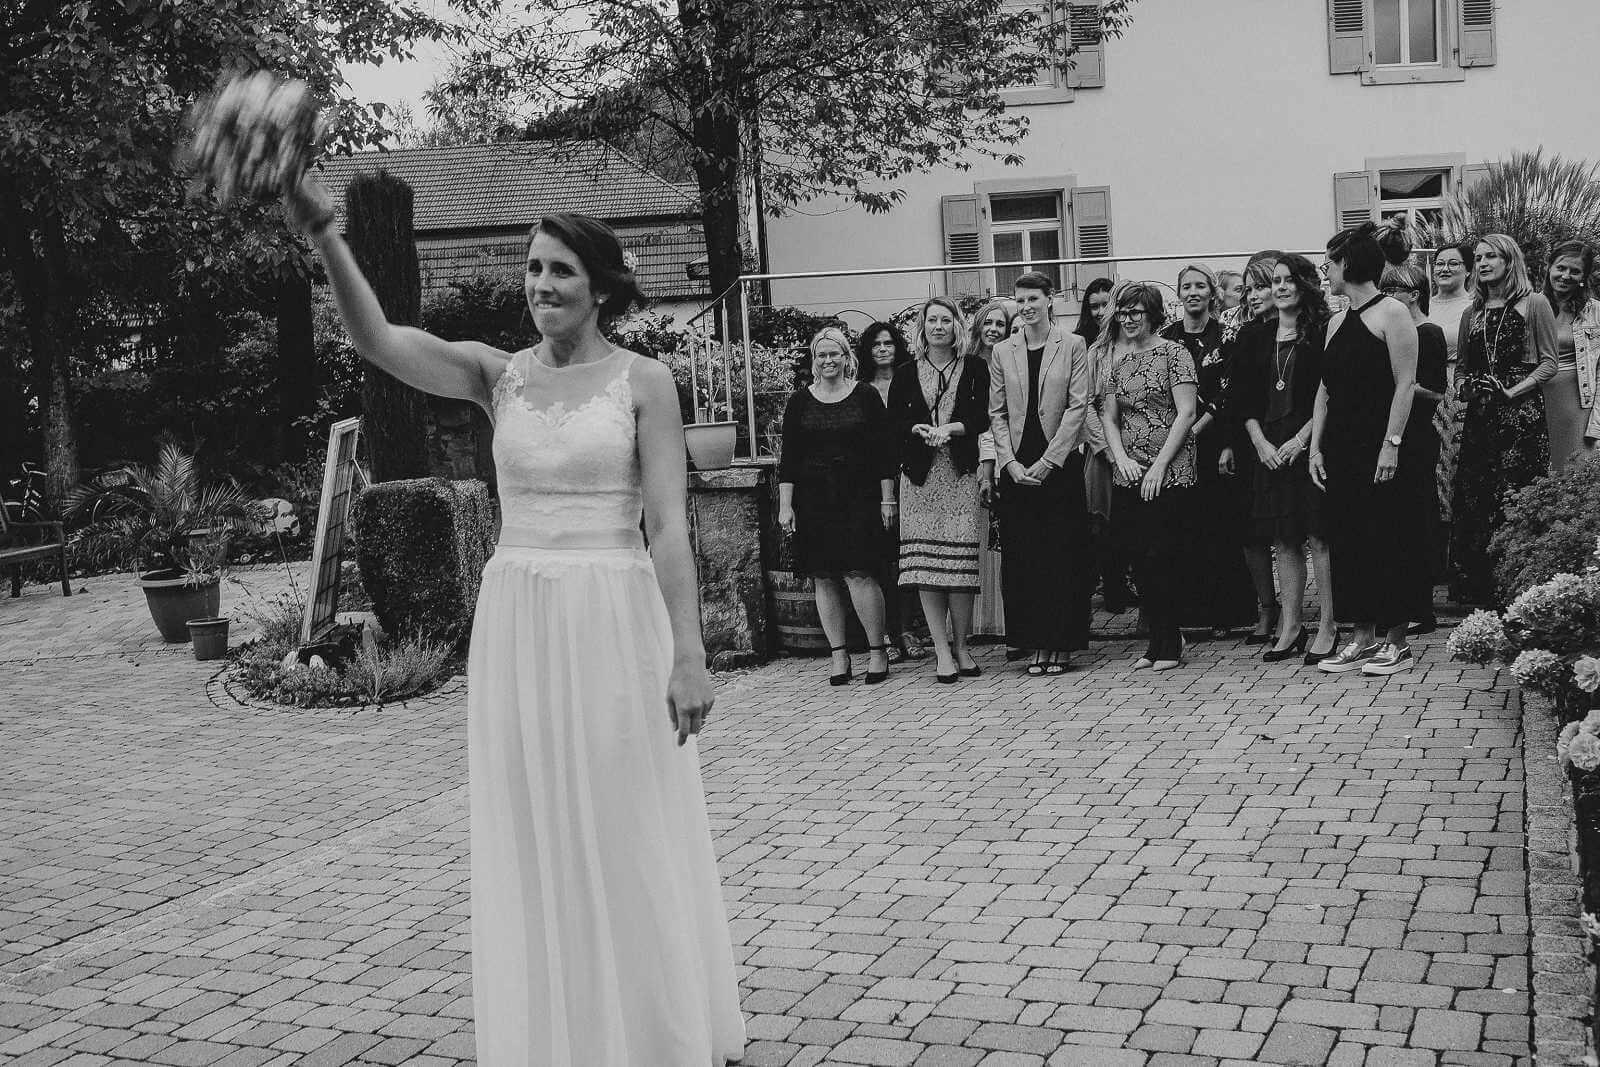 Hochzeitsfotograf Offenburg Zell am Harmersbach Bärenkeller (55)